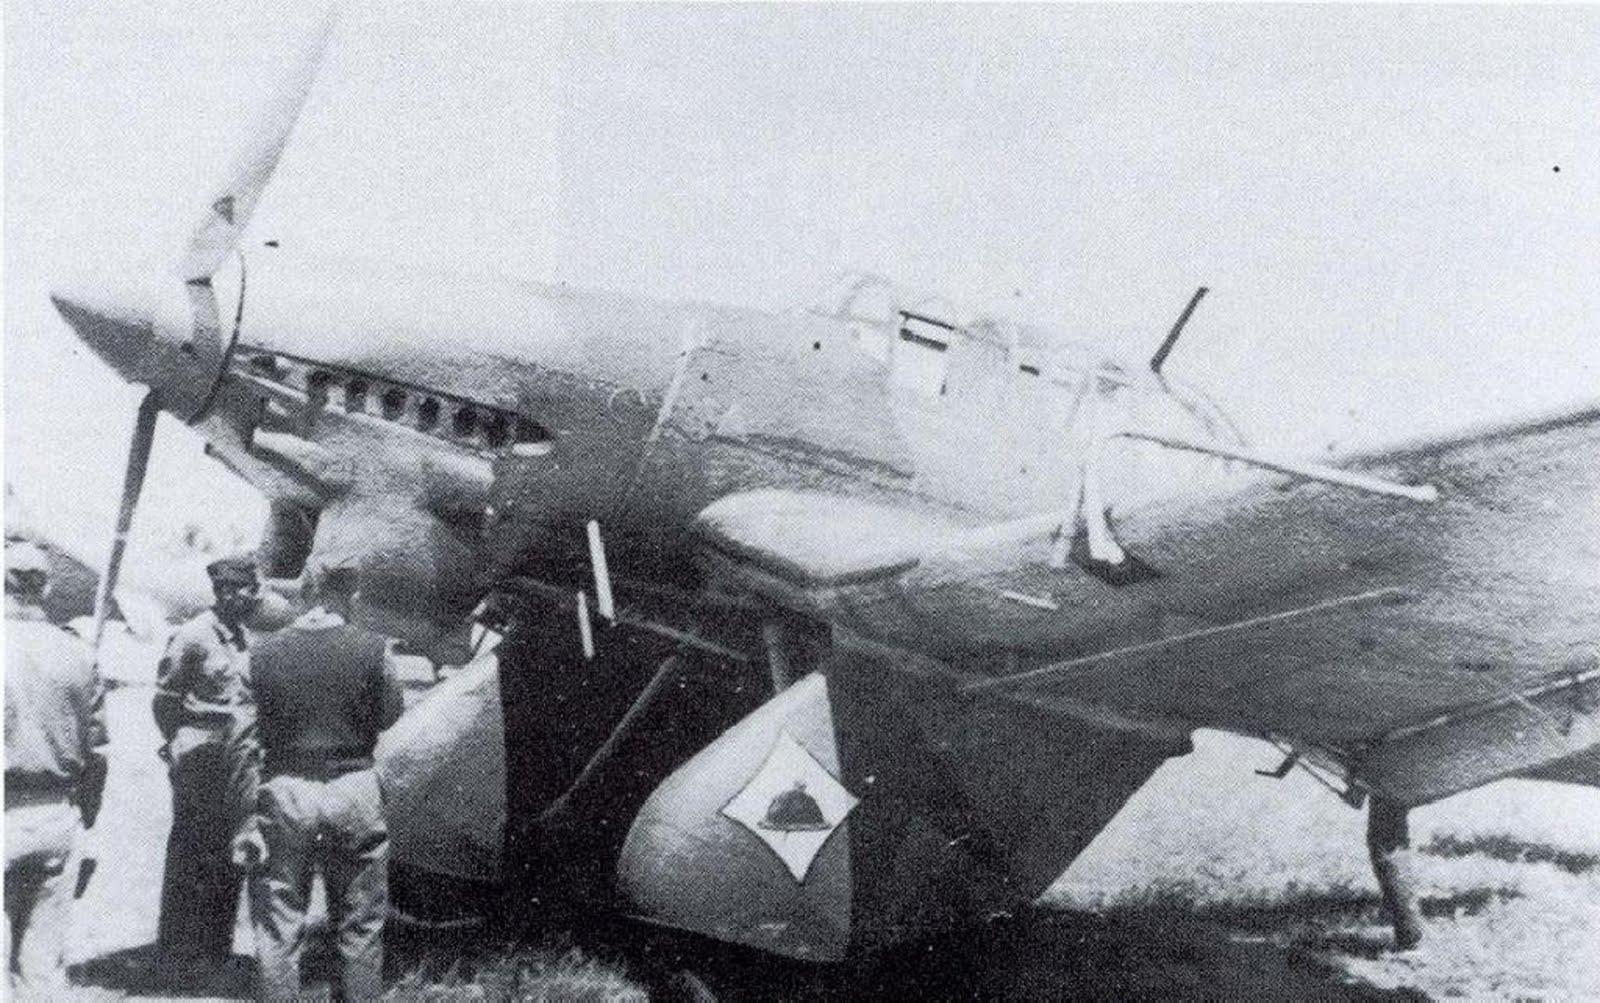 la légion condor et aviation italienne 29-3+CON+EMBLEMA+3